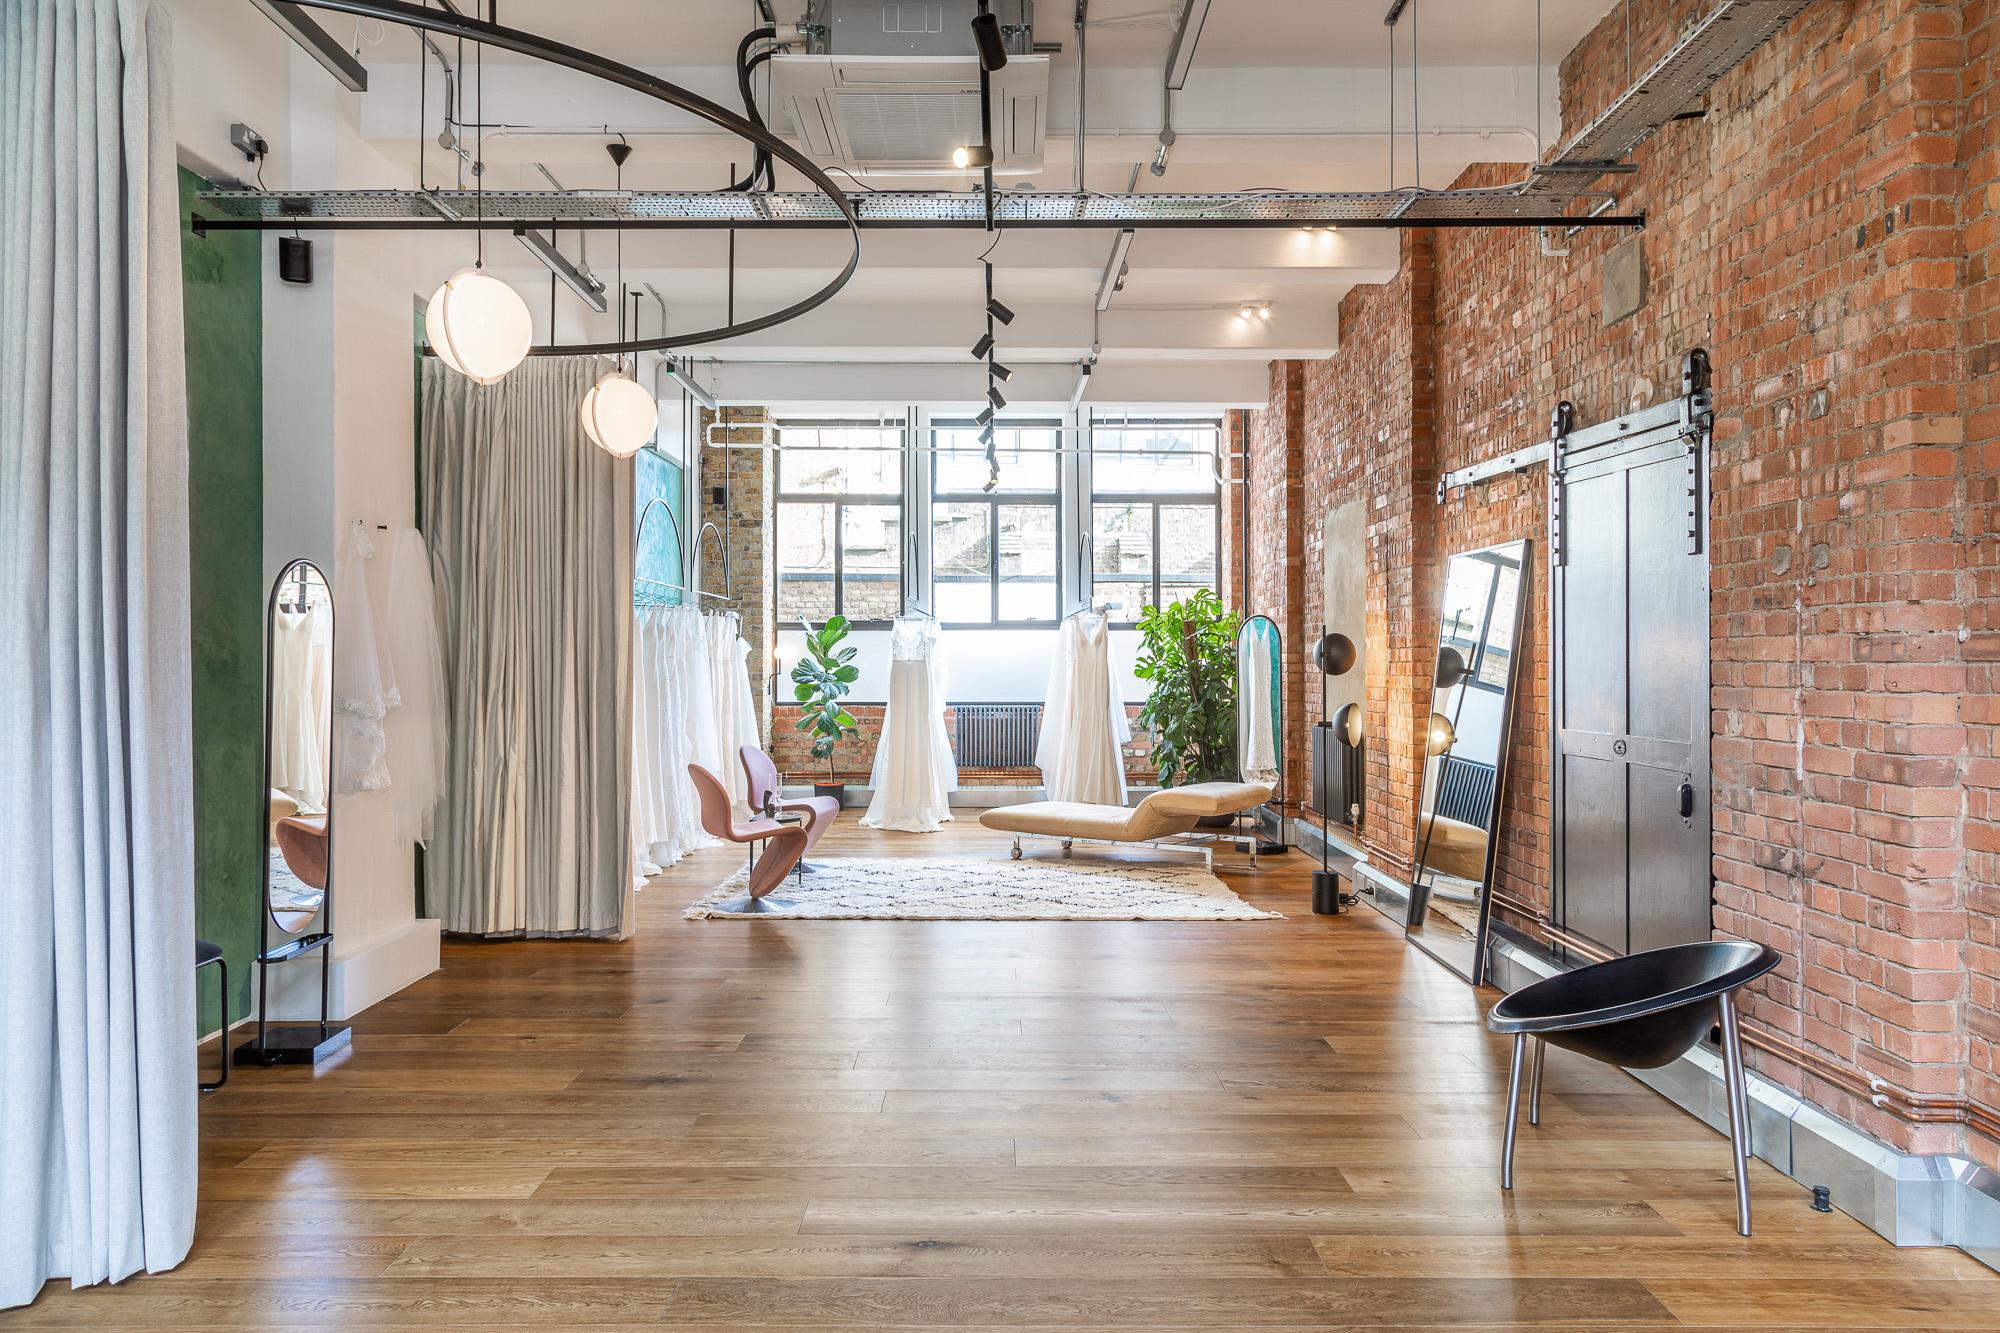 jonathan bond, interior photographer, showroom, made with love, london